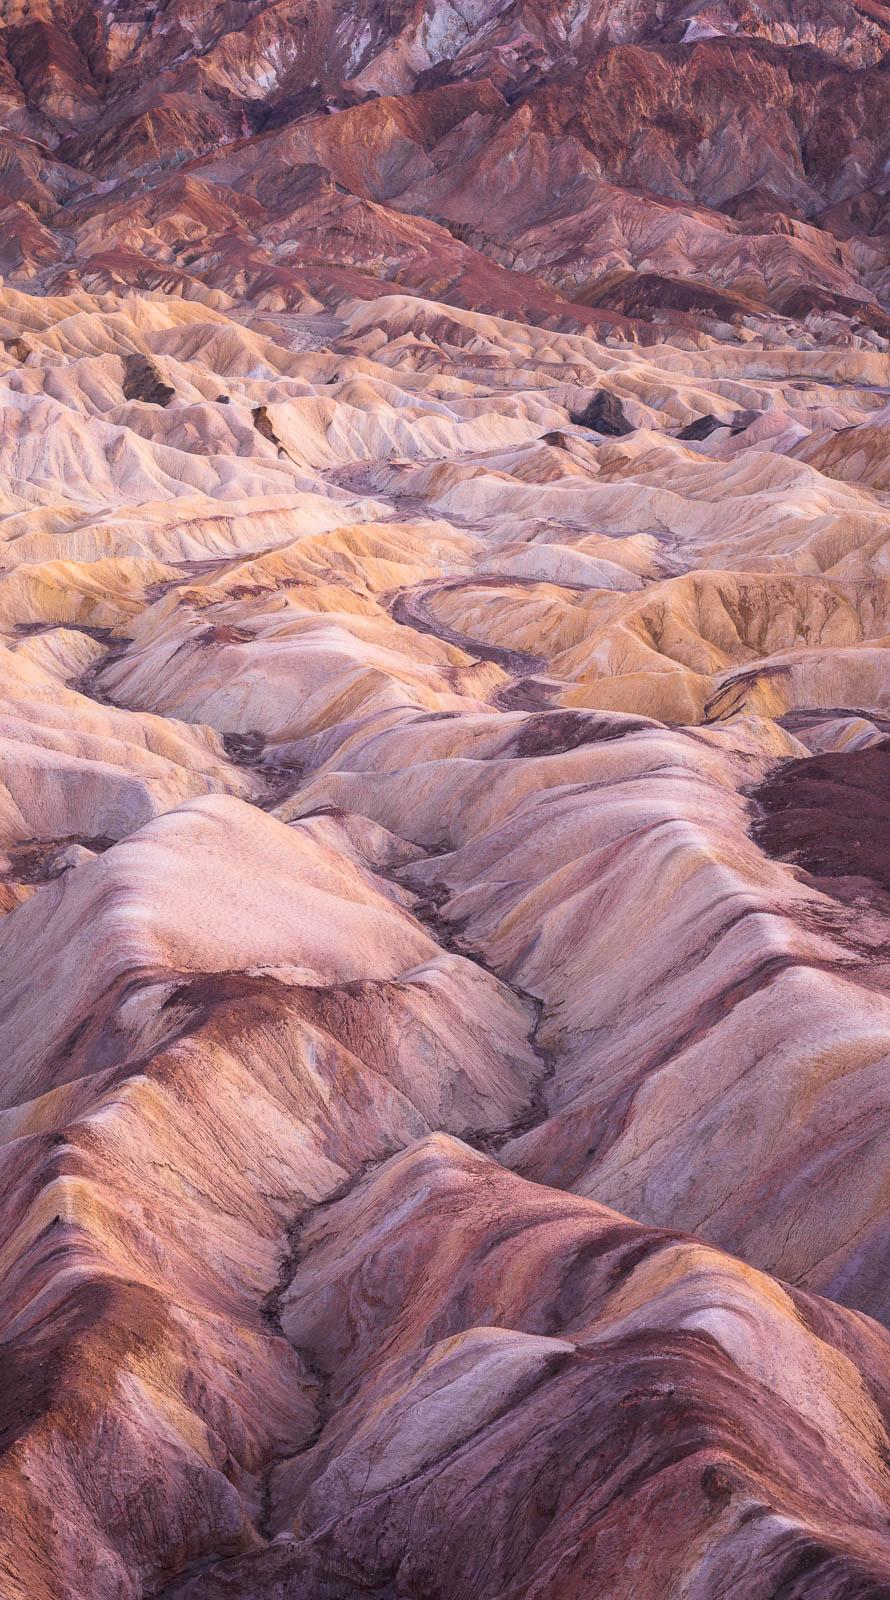 badlands, california, death valley national park, panorama, red, yellow, zabriskie point, mojave desert, vertical panorama